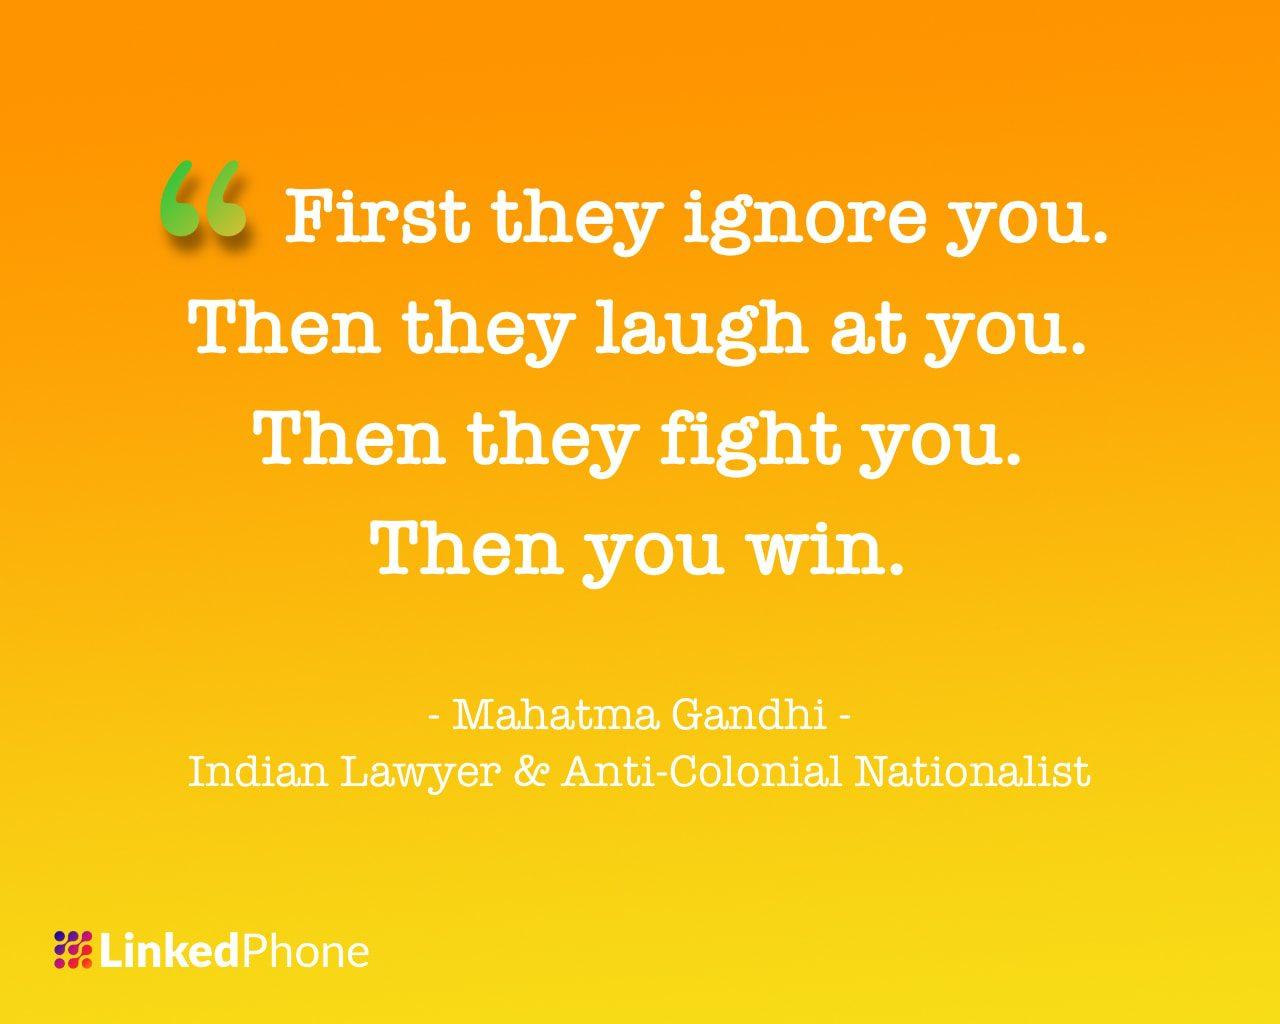 Mahatma Gandhi - Motivational Inspirational Quotes and Sayings 2